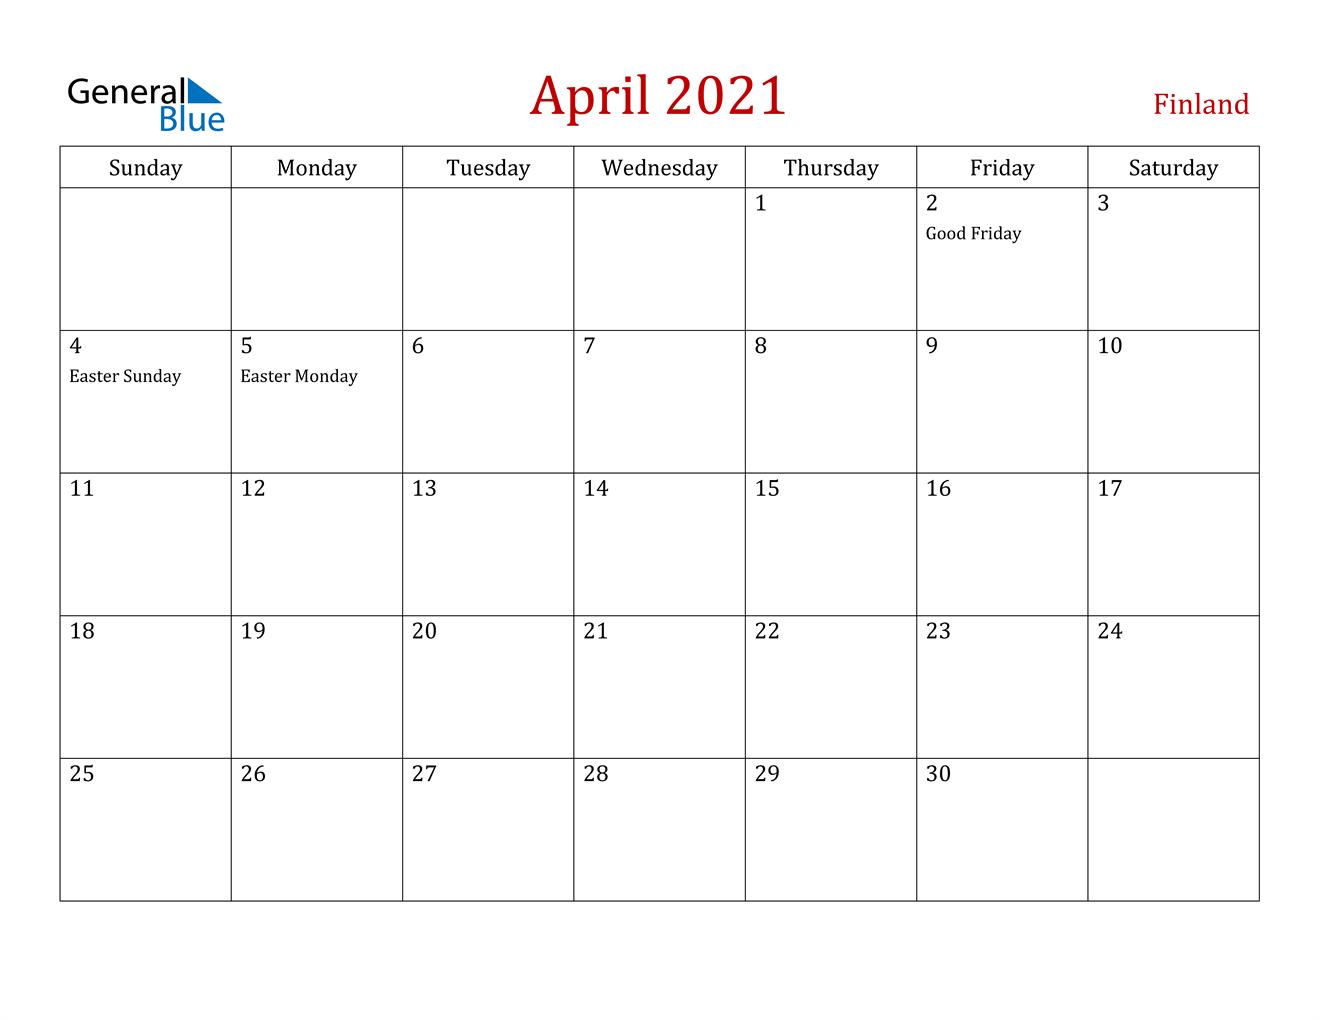 April 2021 Calendar - Finland